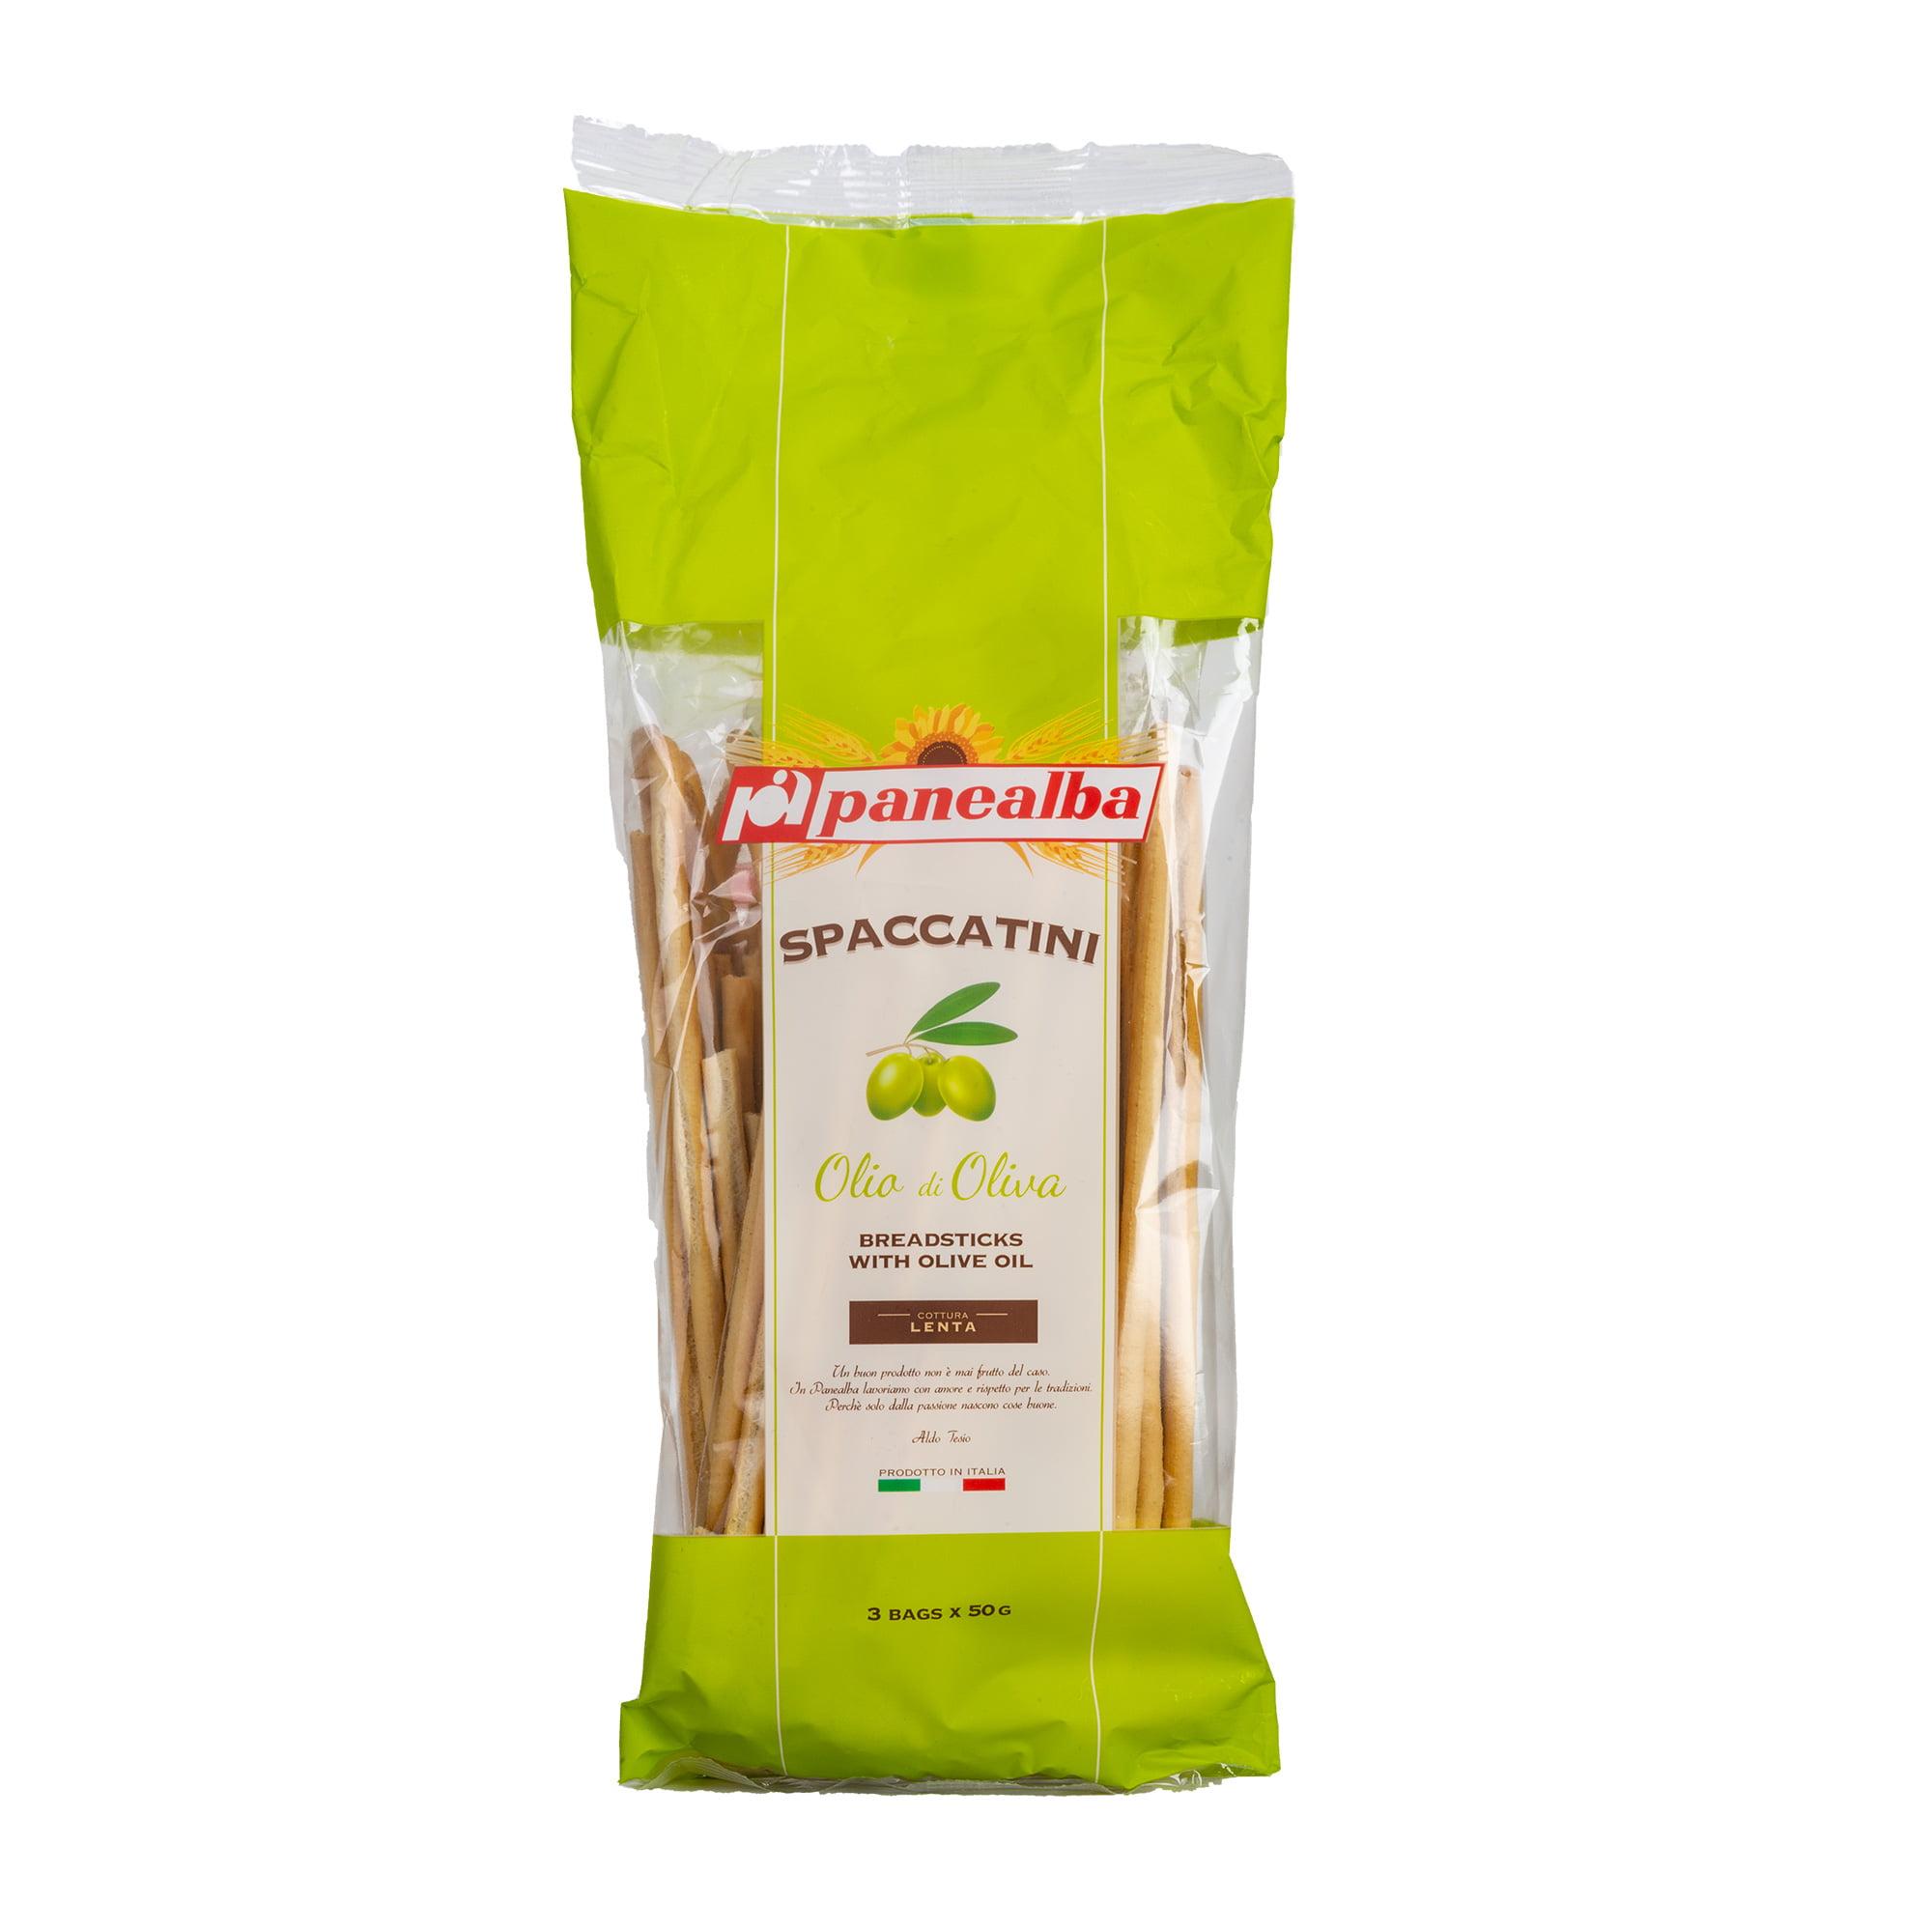 Spaccatini olijfolie Panealba